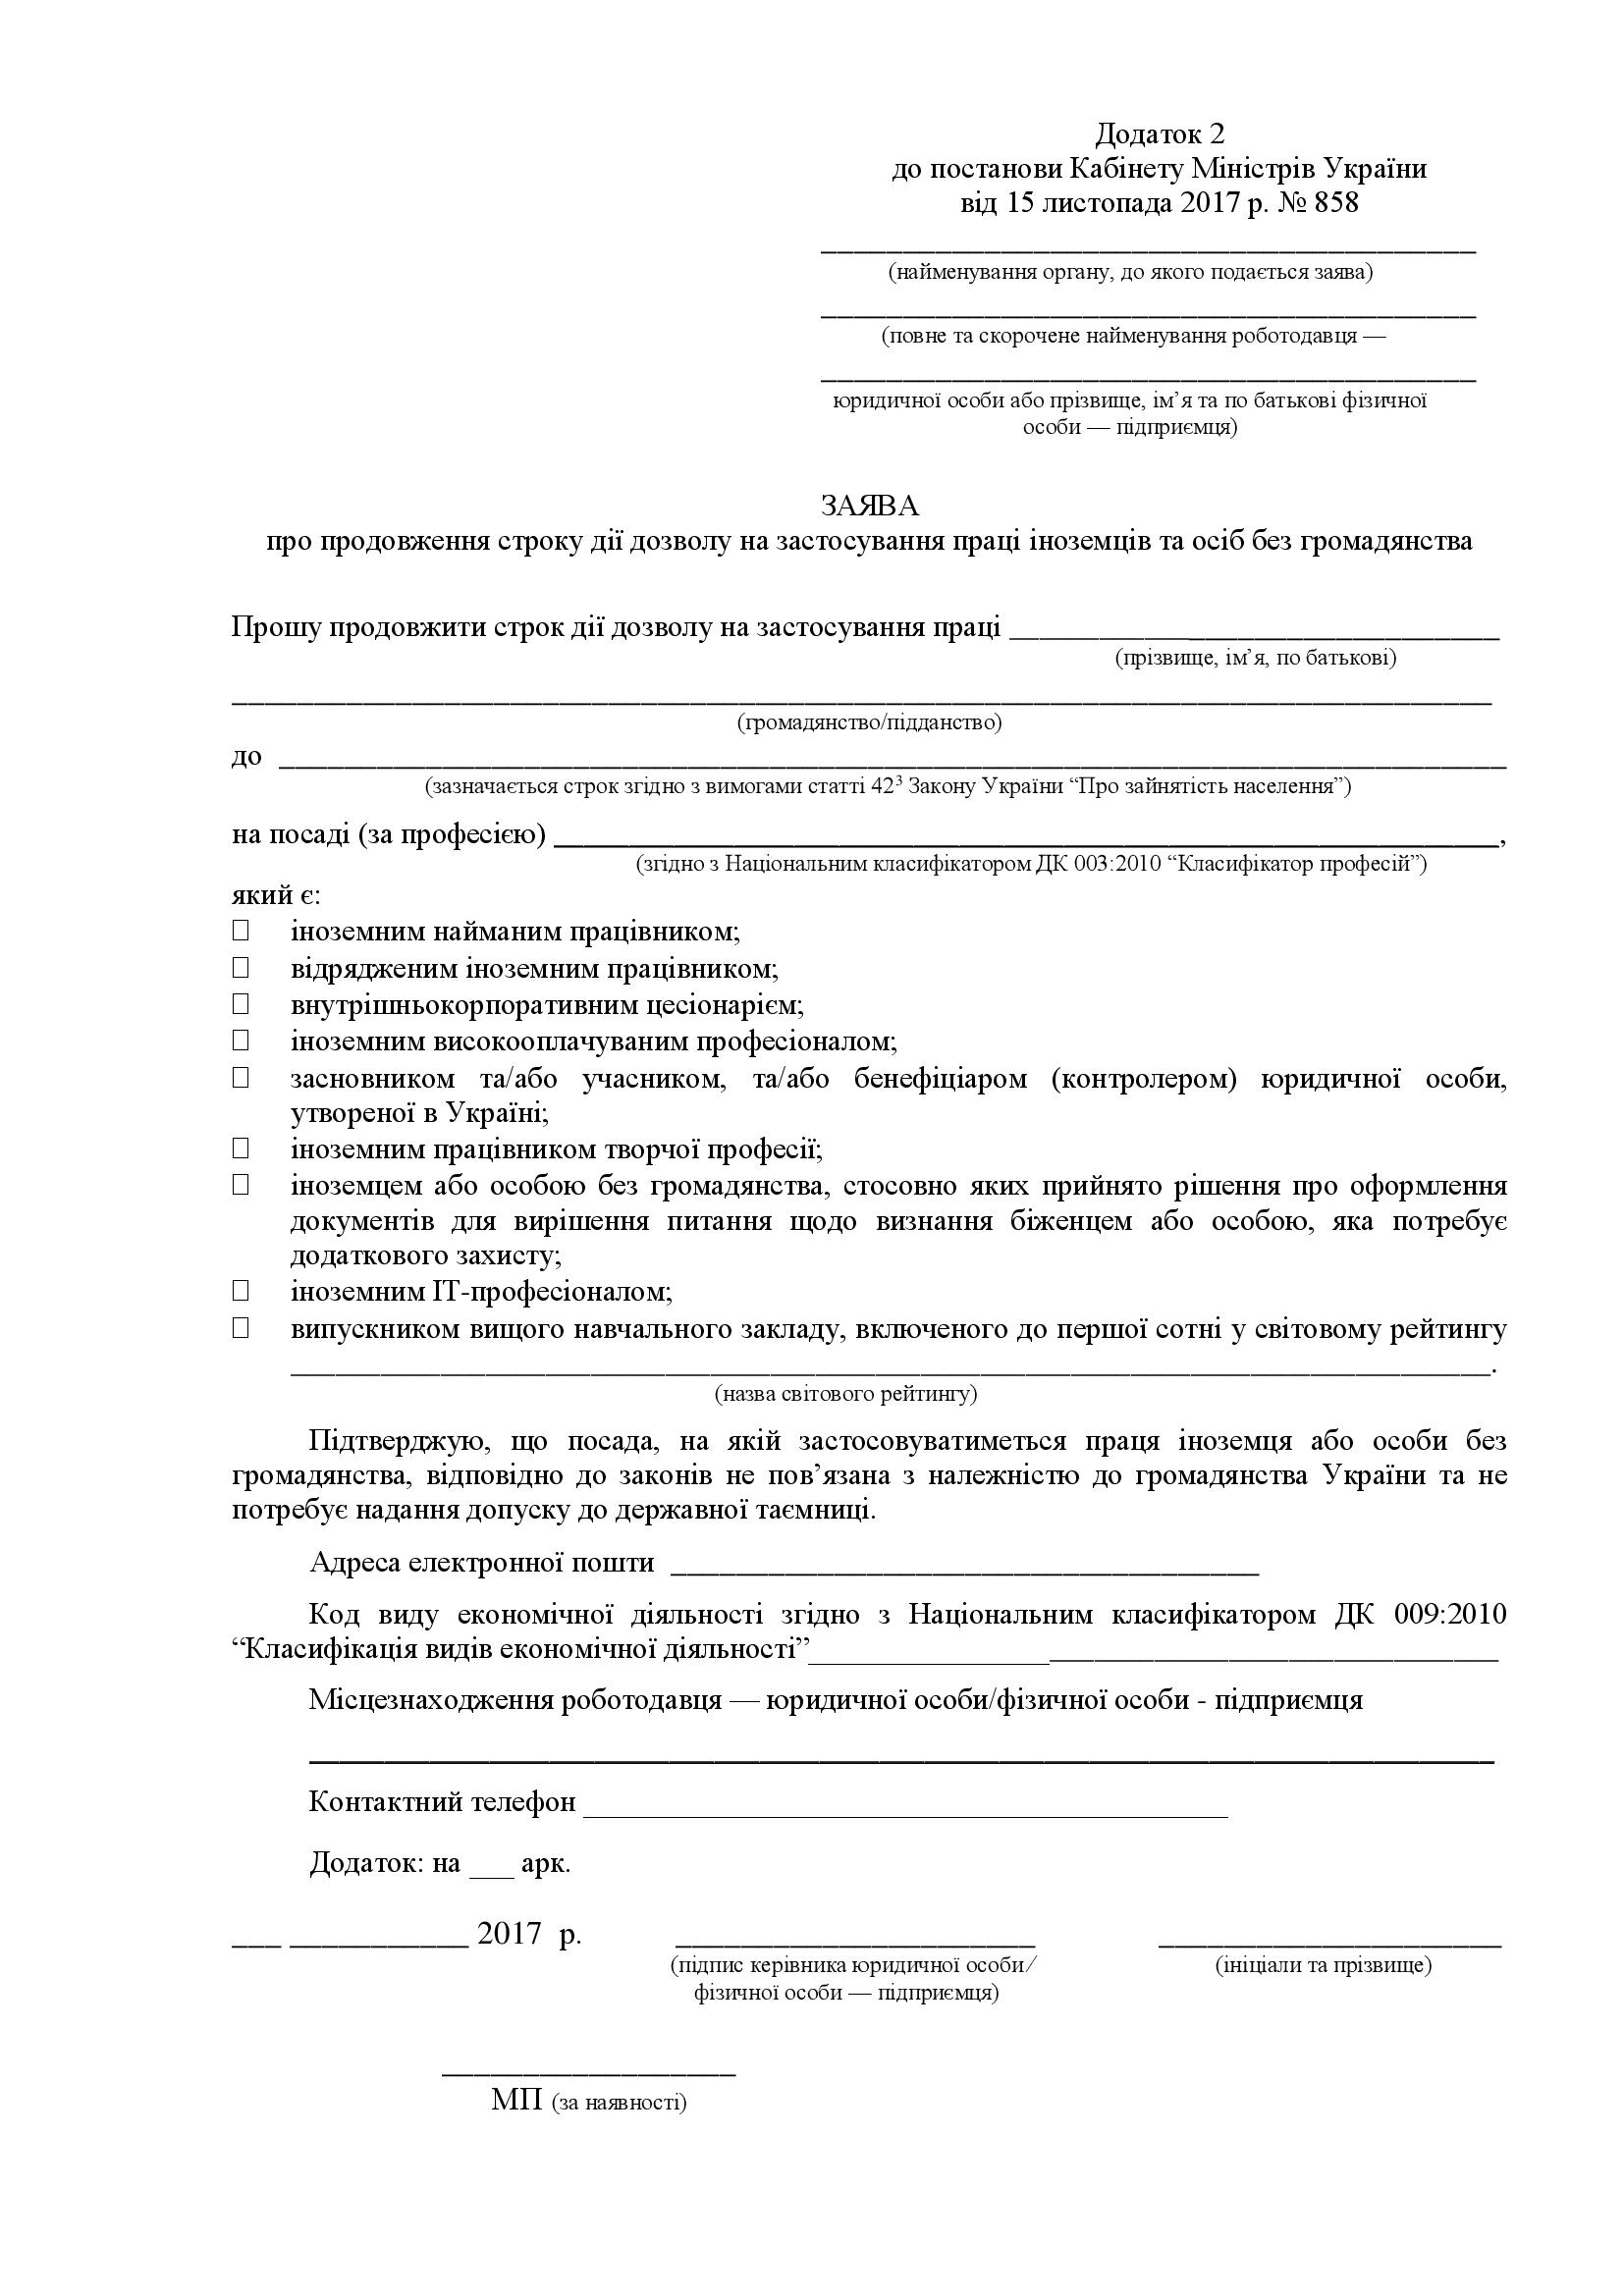 форма трудового договору мж працвником  фзичною особою бланк